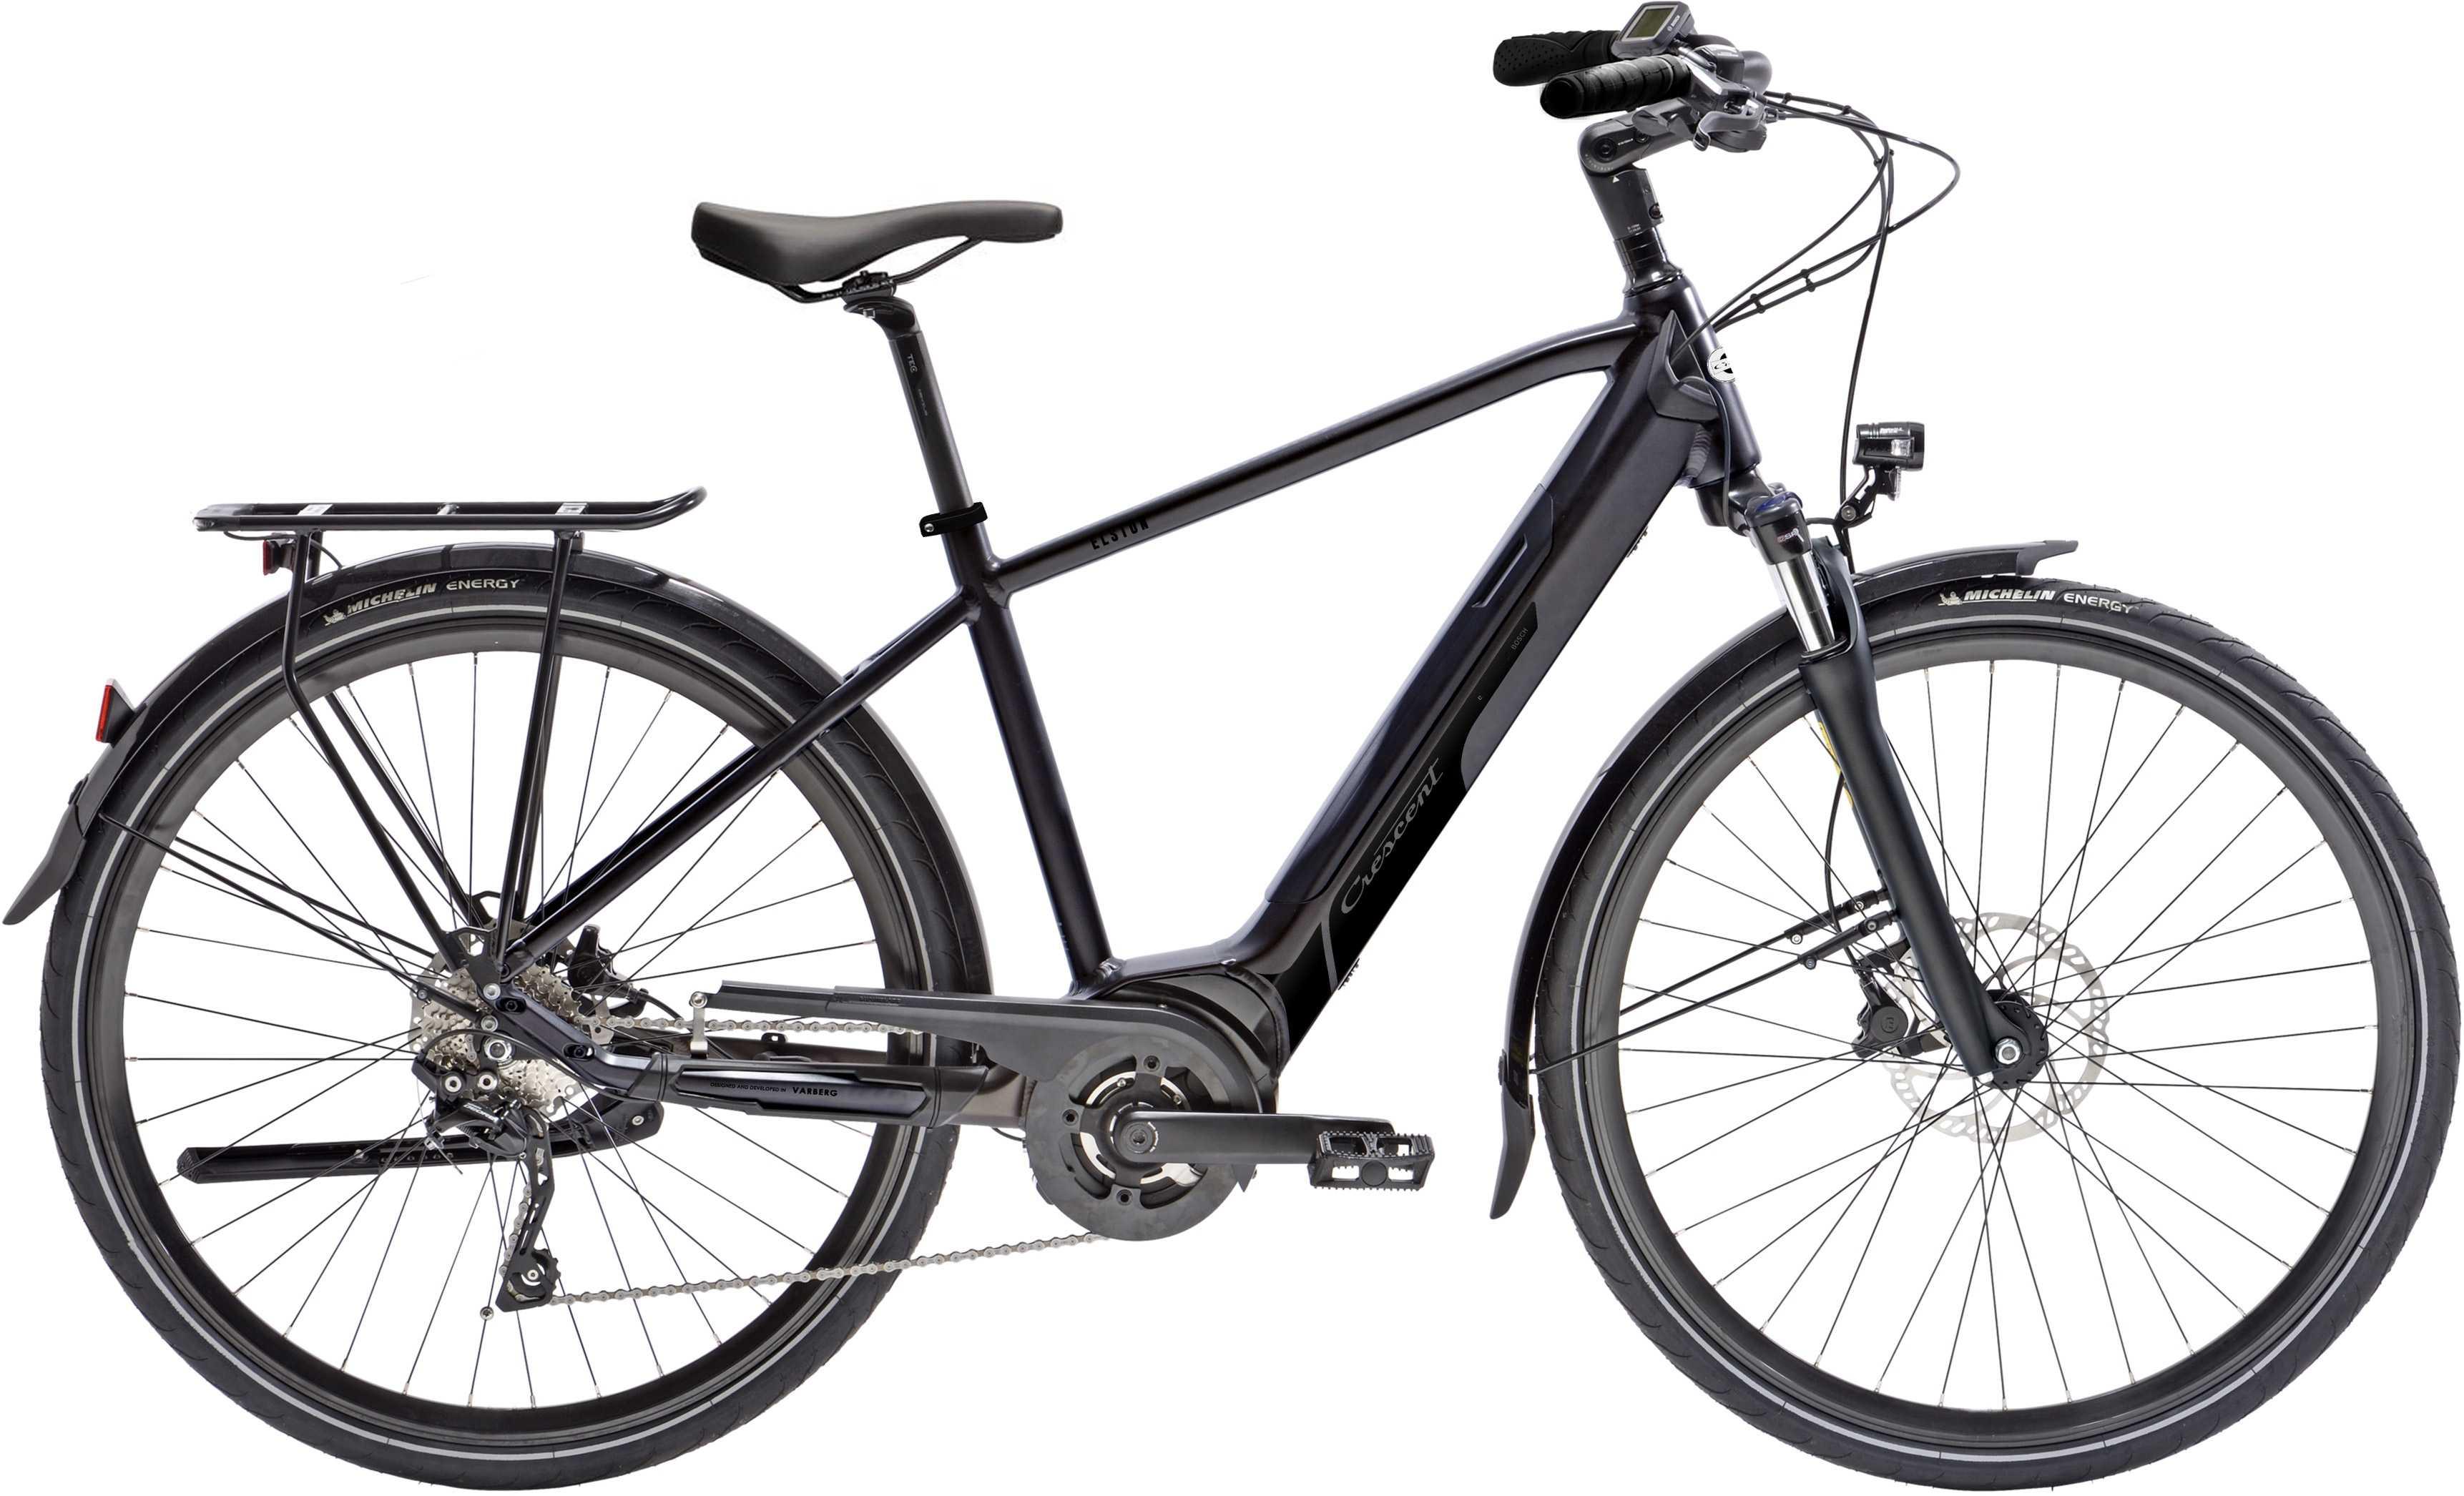 Crescent Elston mörkgrå | City-cykler